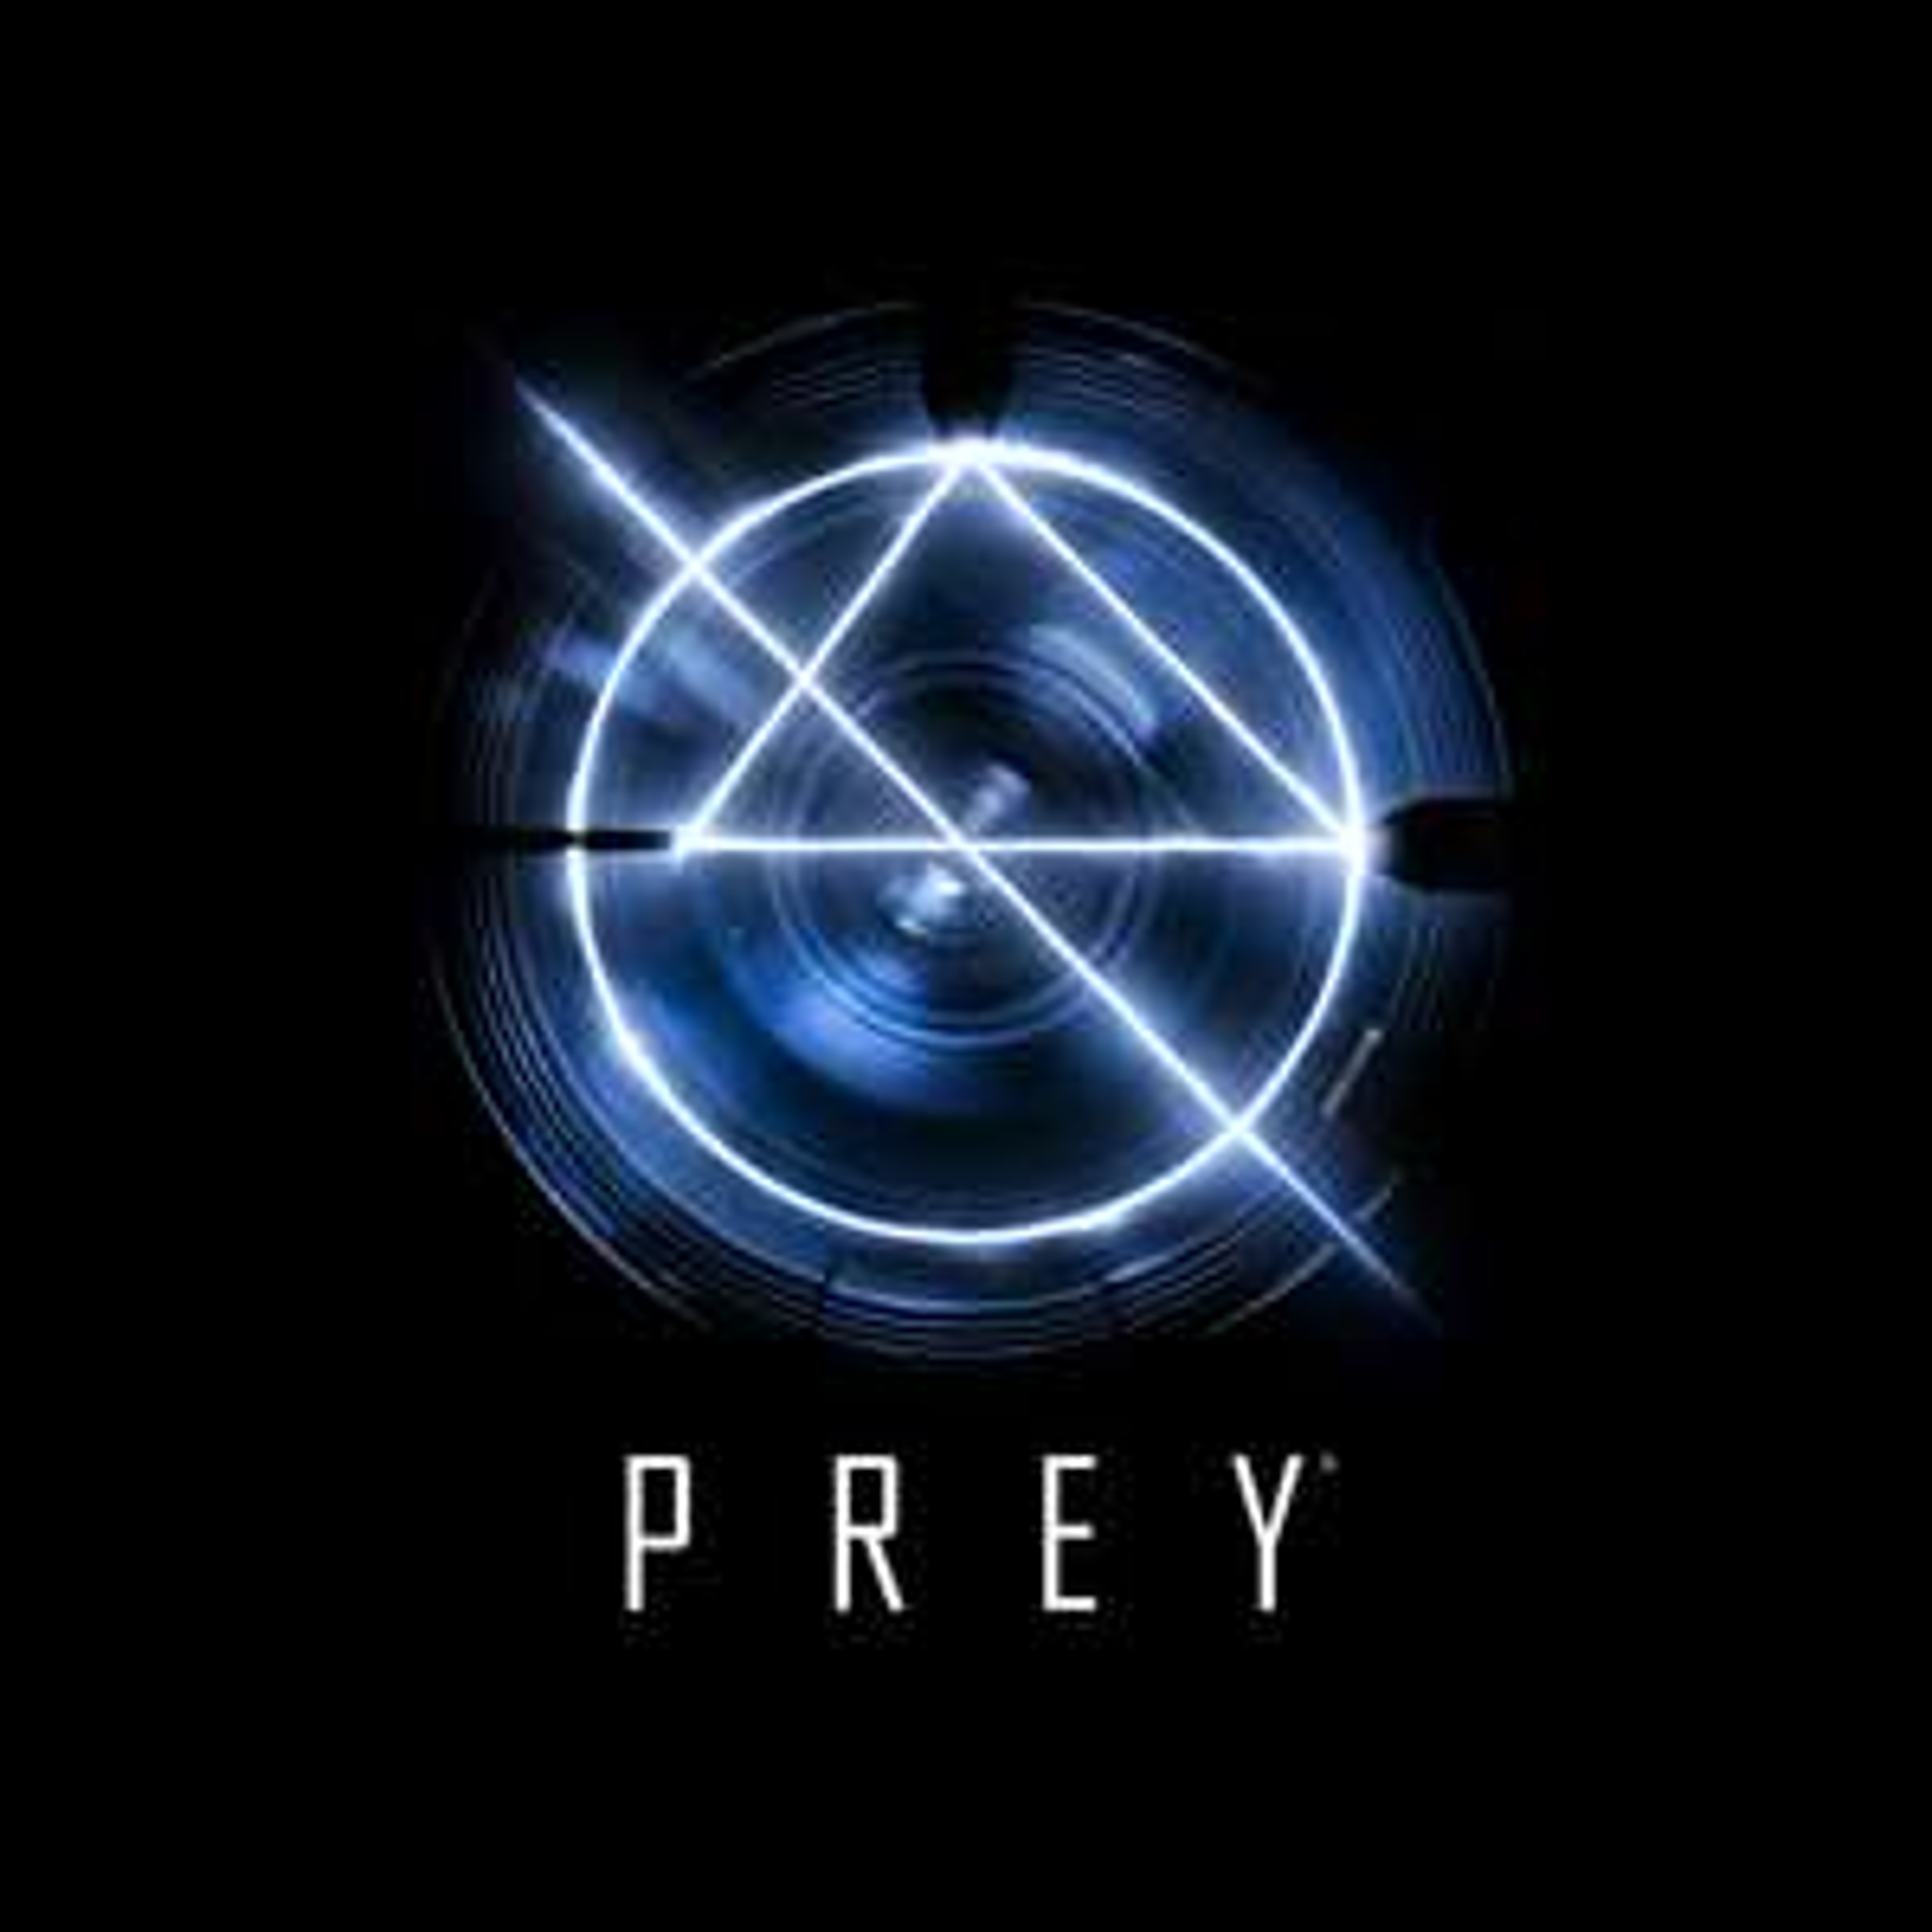 [Steam] Prey - £3.99 (Digital Deluxe - £6.00 / Mooncrash DLC - £2.60) - Steam Store